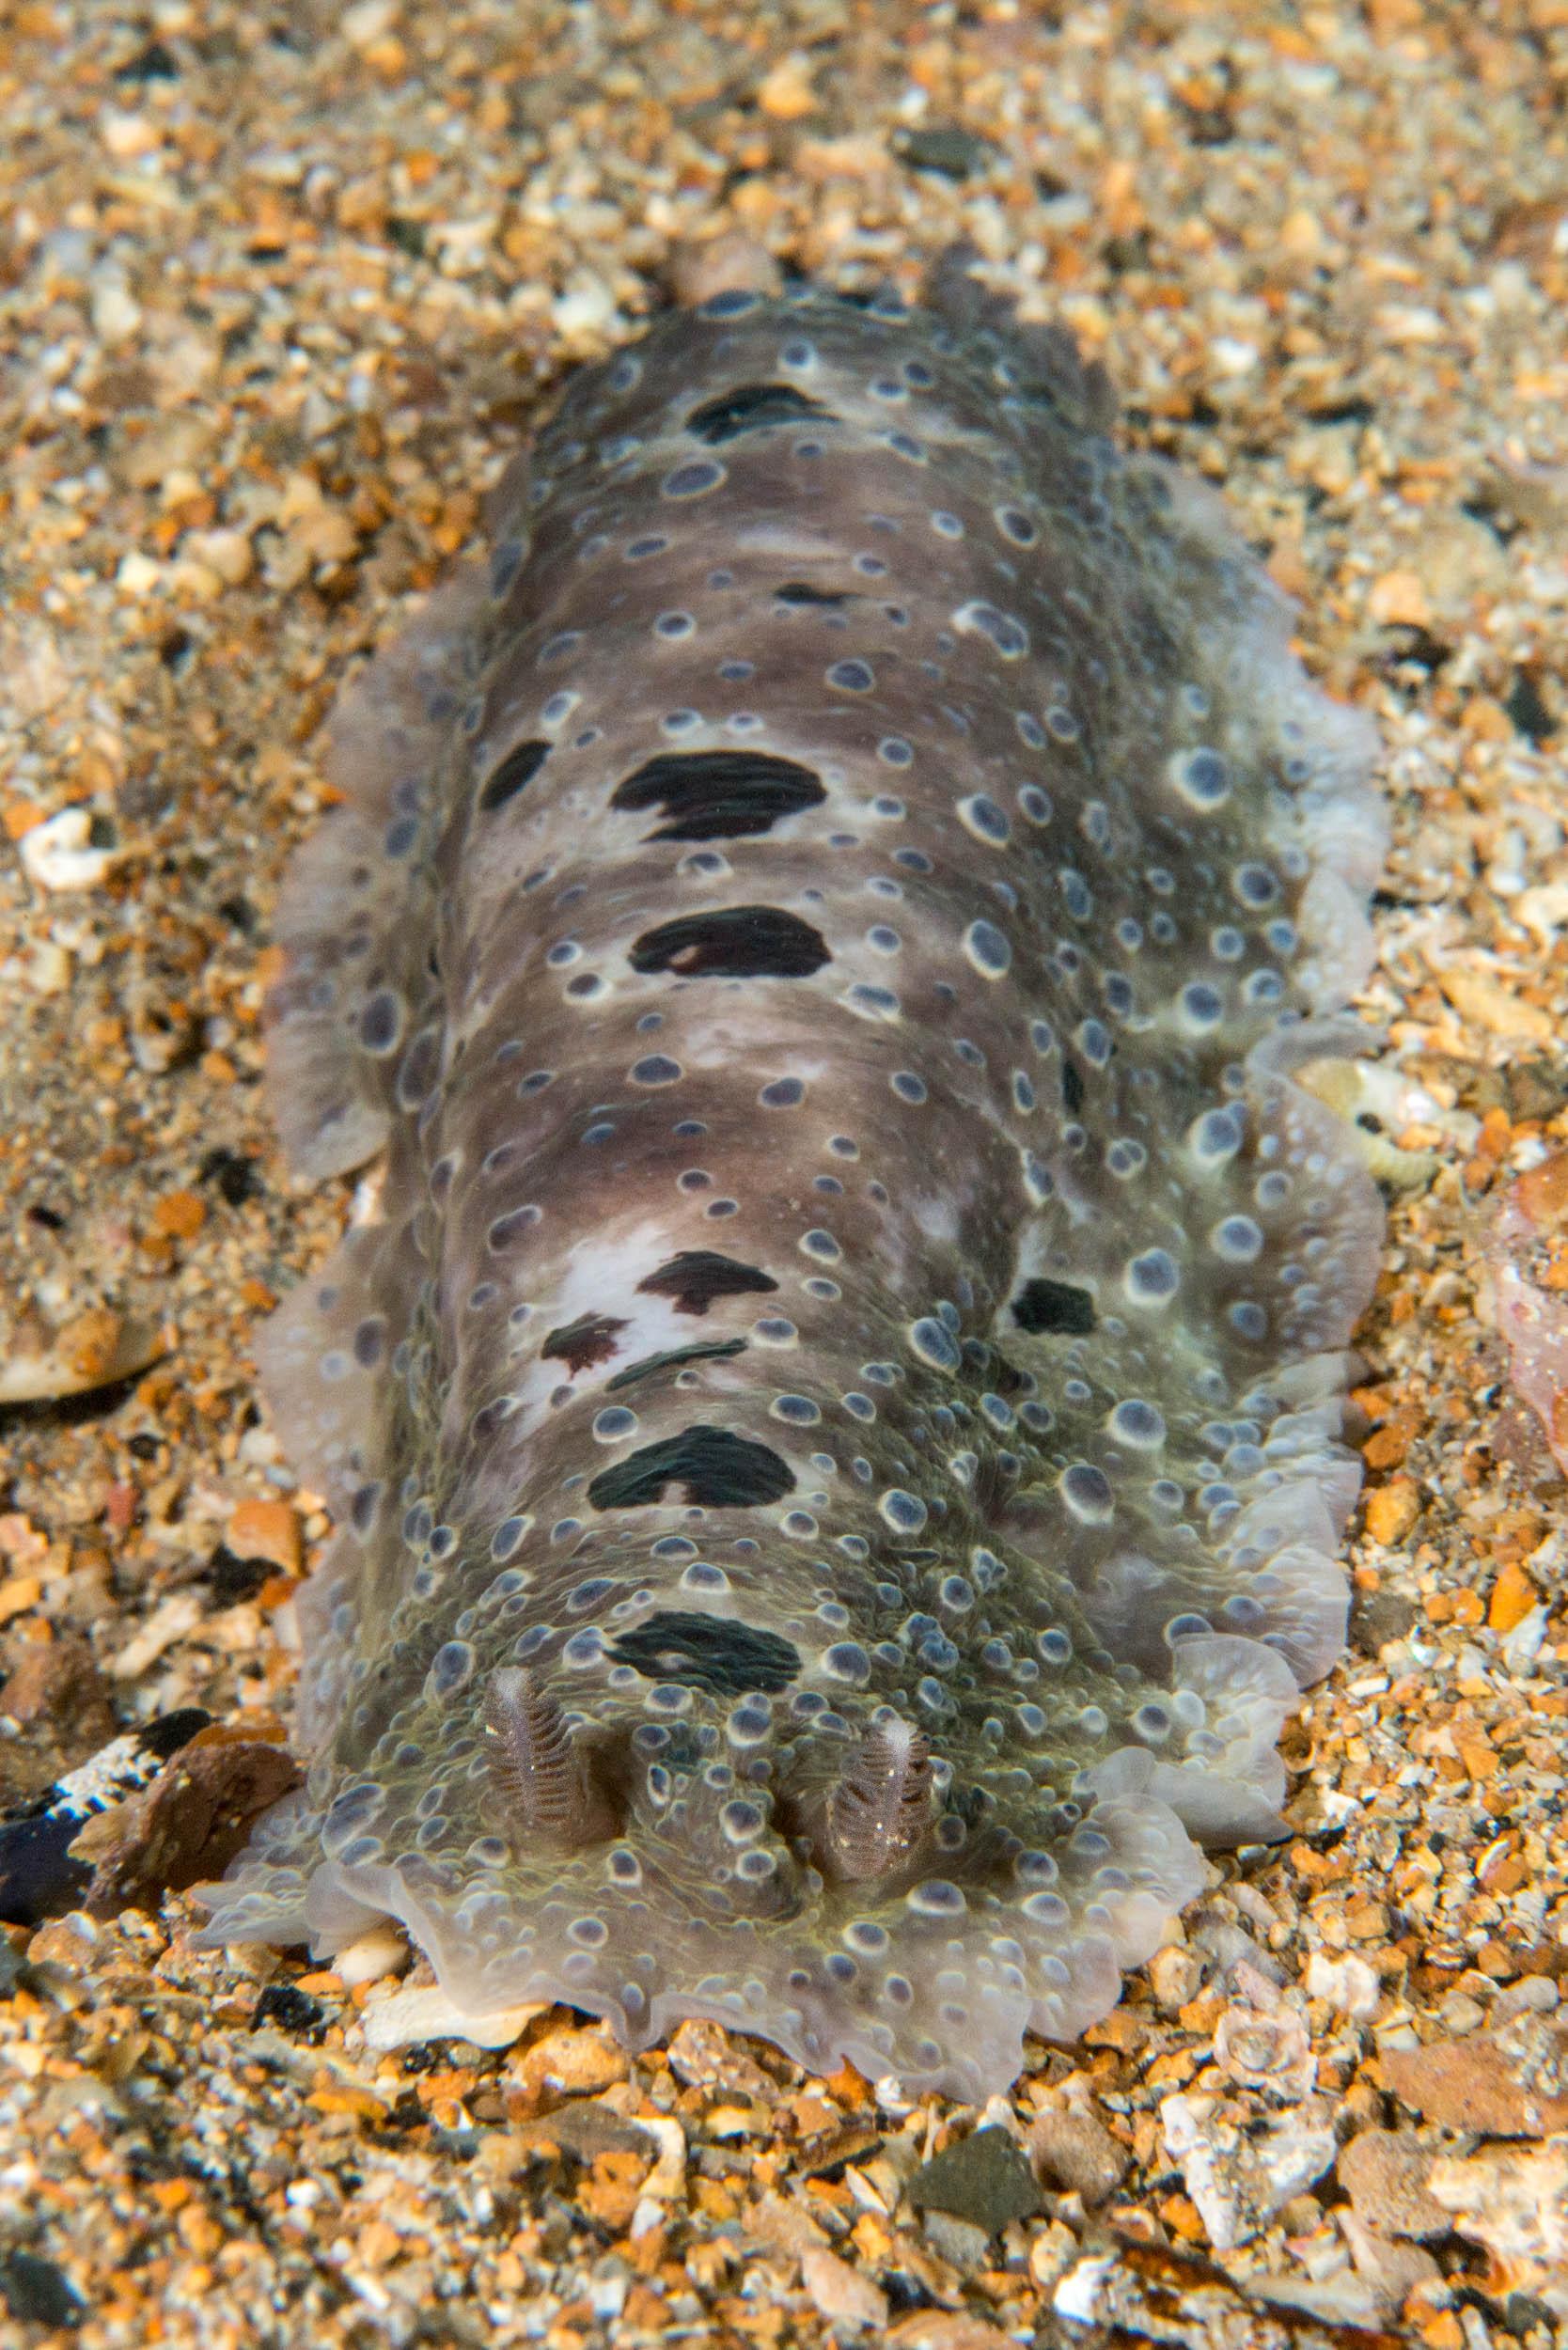 Nudibranch (Dendrodoris albopurpura)